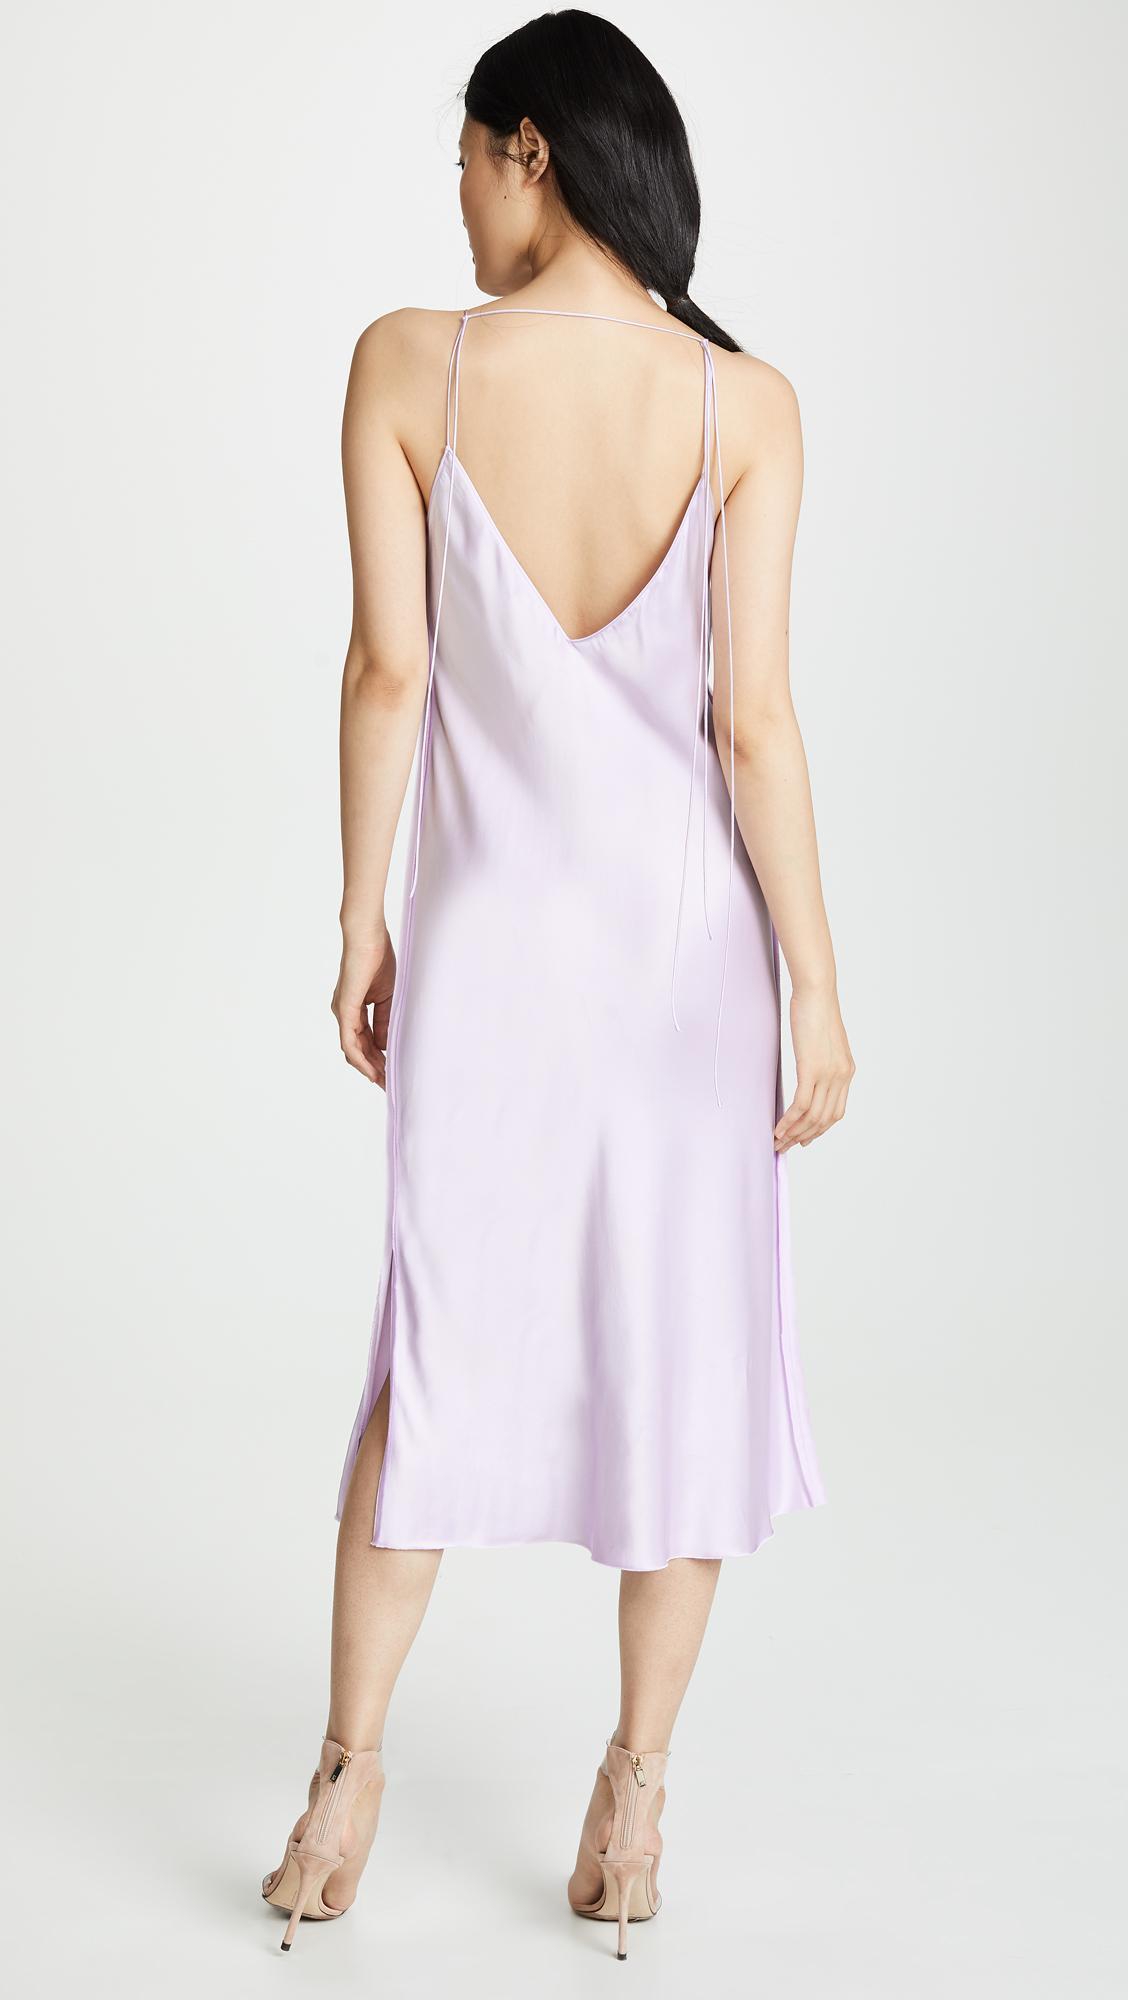 05452bd5fef6 Helmut Lang - Purple Raw Detail Slip Dress - Lyst. View fullscreen